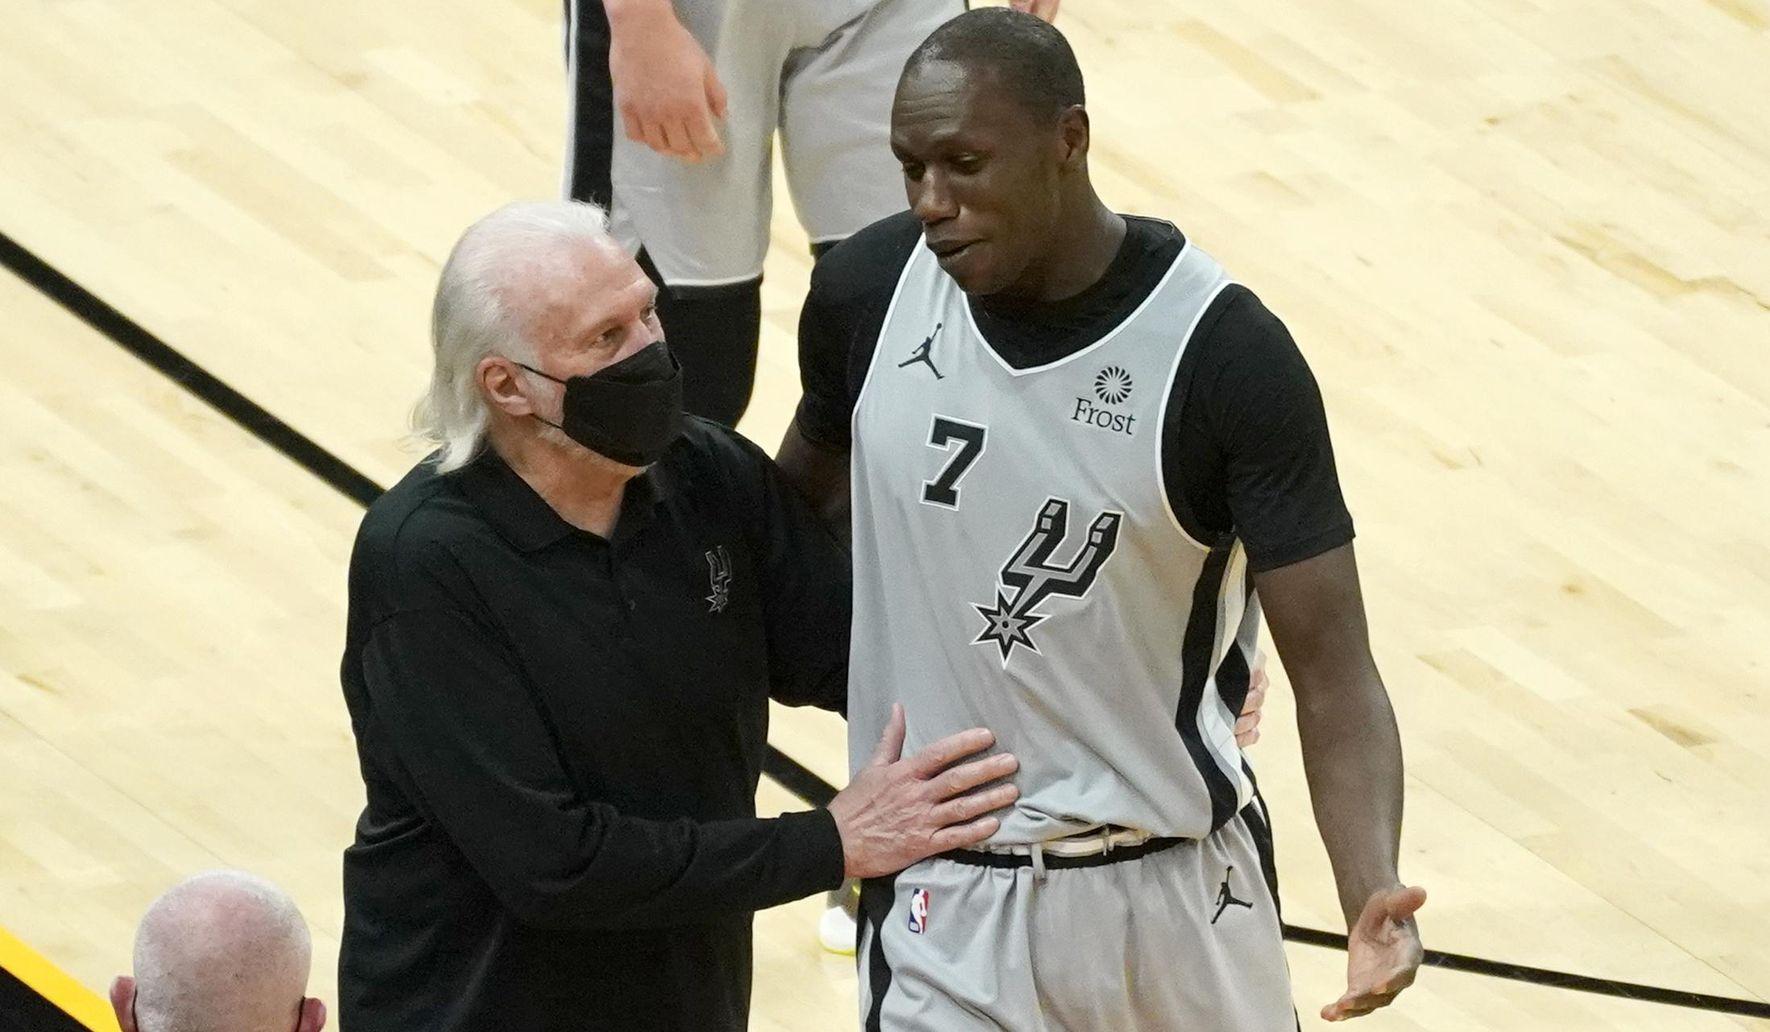 Spurs_suns_basketball_71810_c0-92-2199-1374_s1770x1032